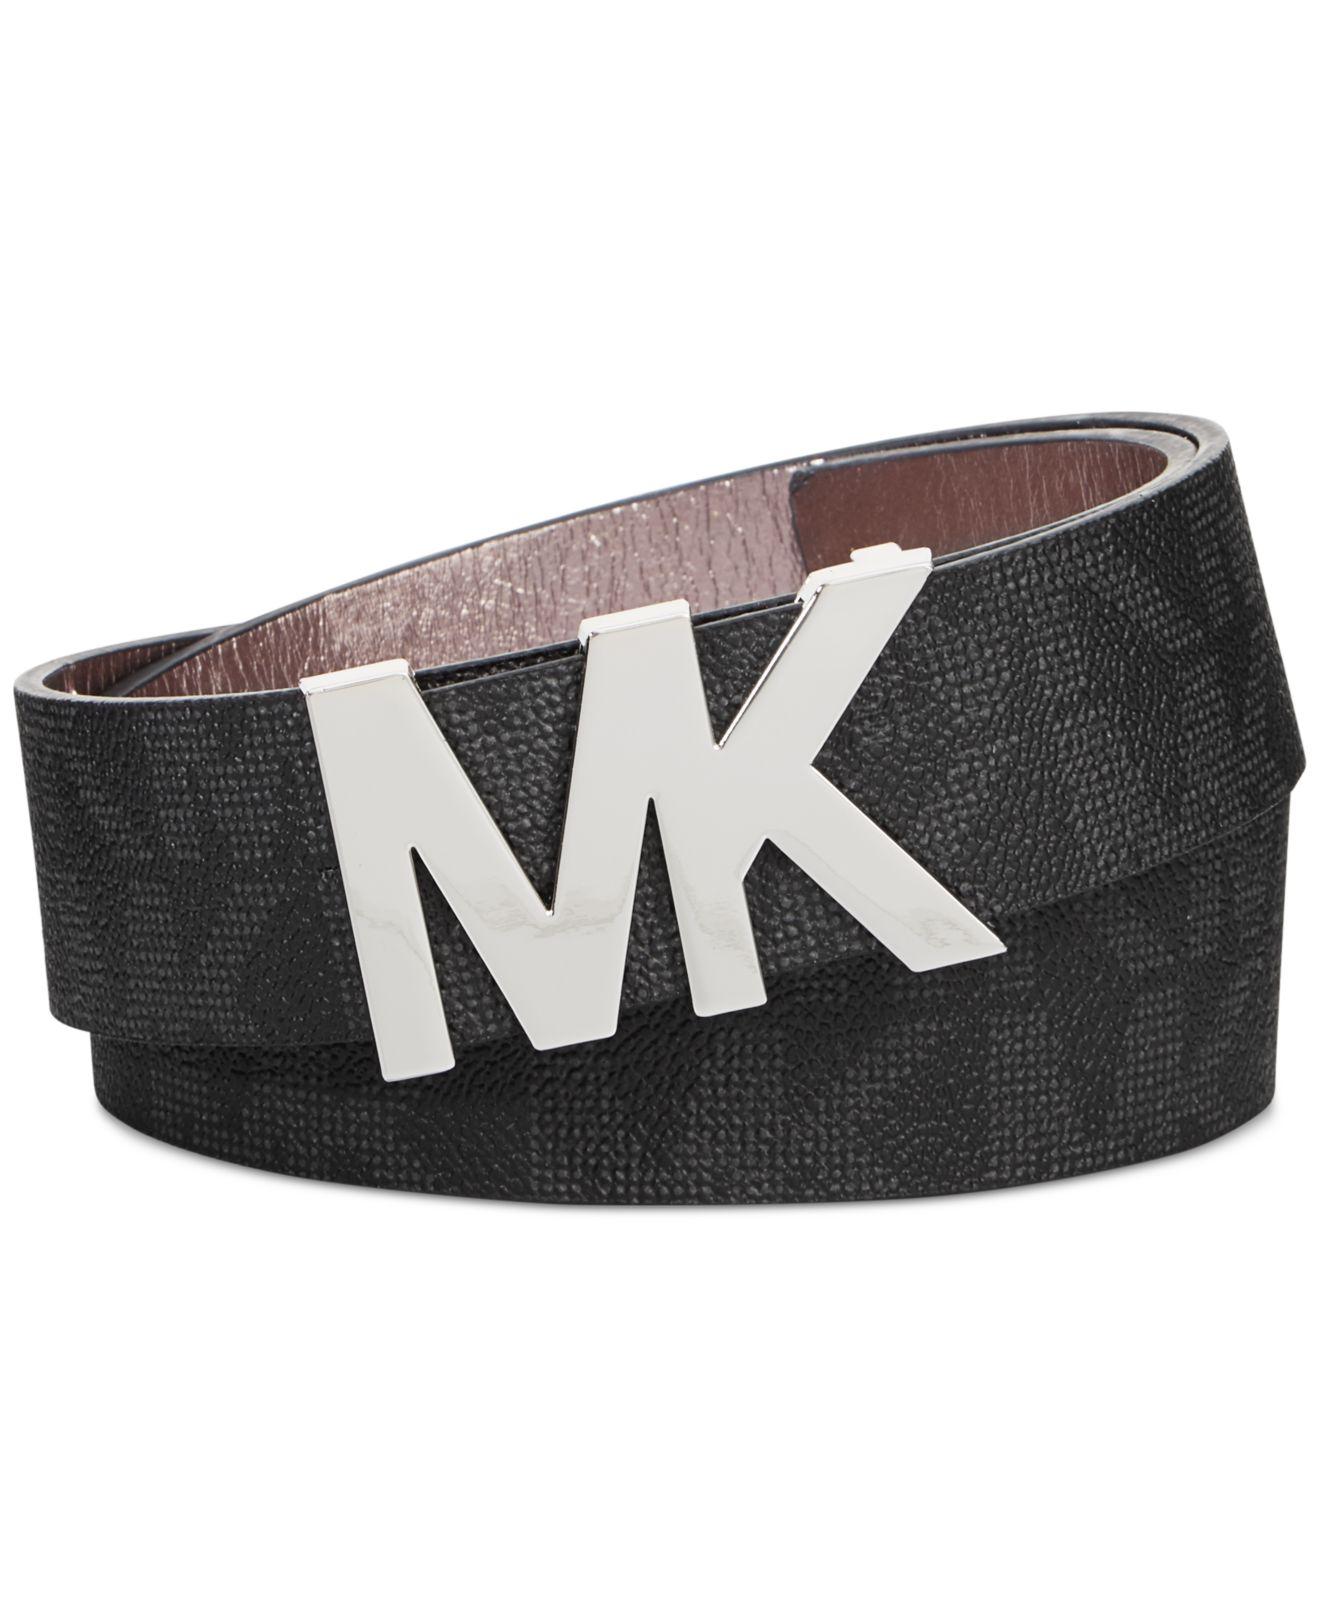 michael kors michael signature belt with mk logo plaque in